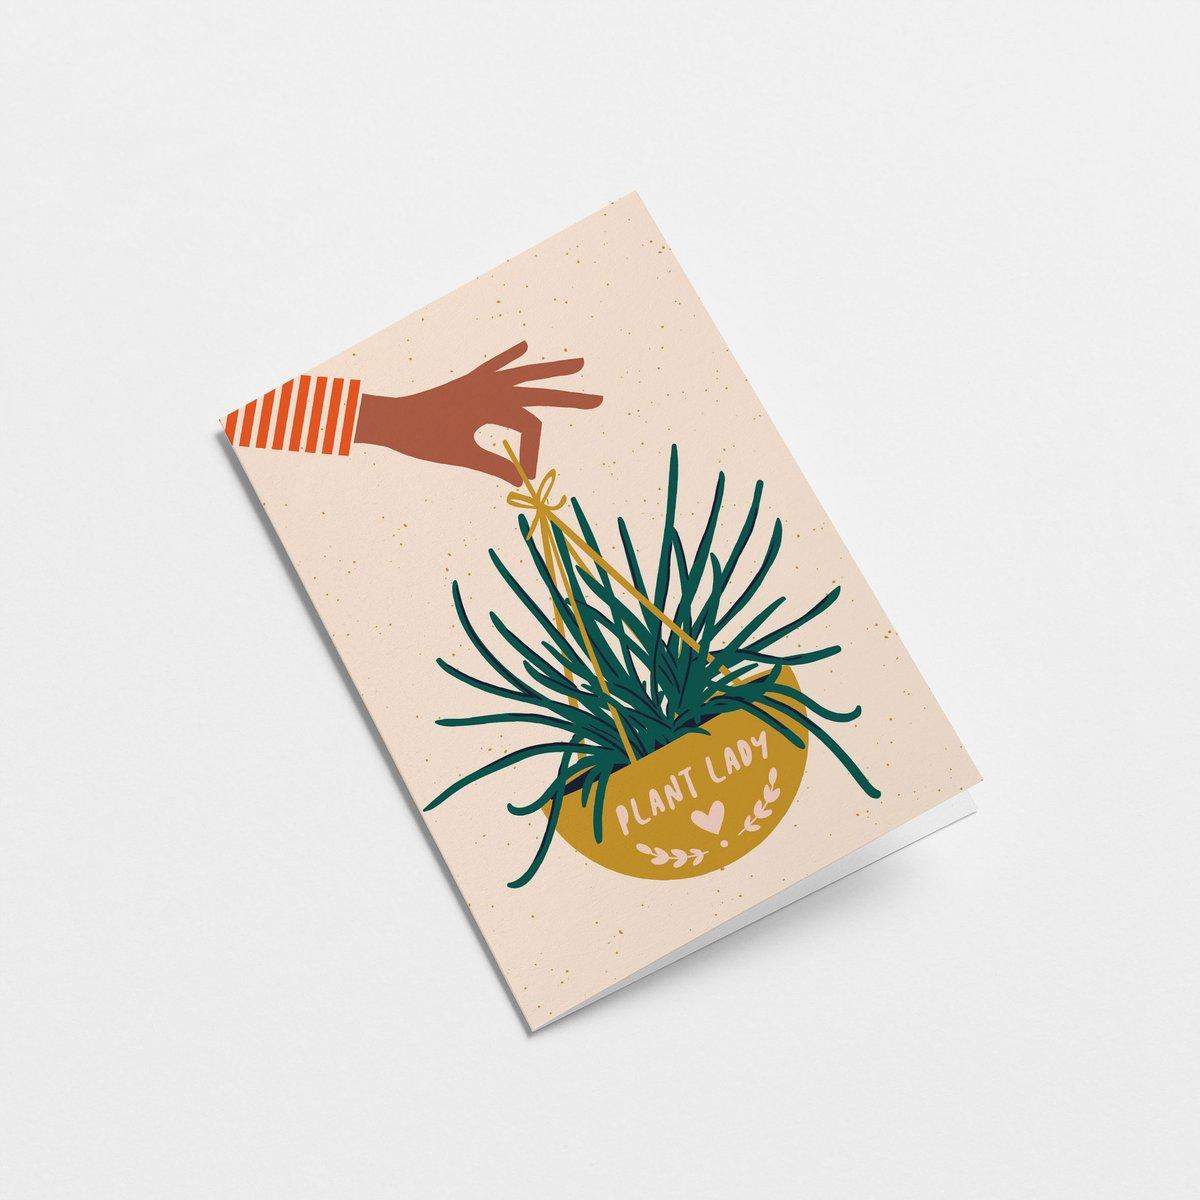 Plantenkamer-graphic-factory-plant-lady